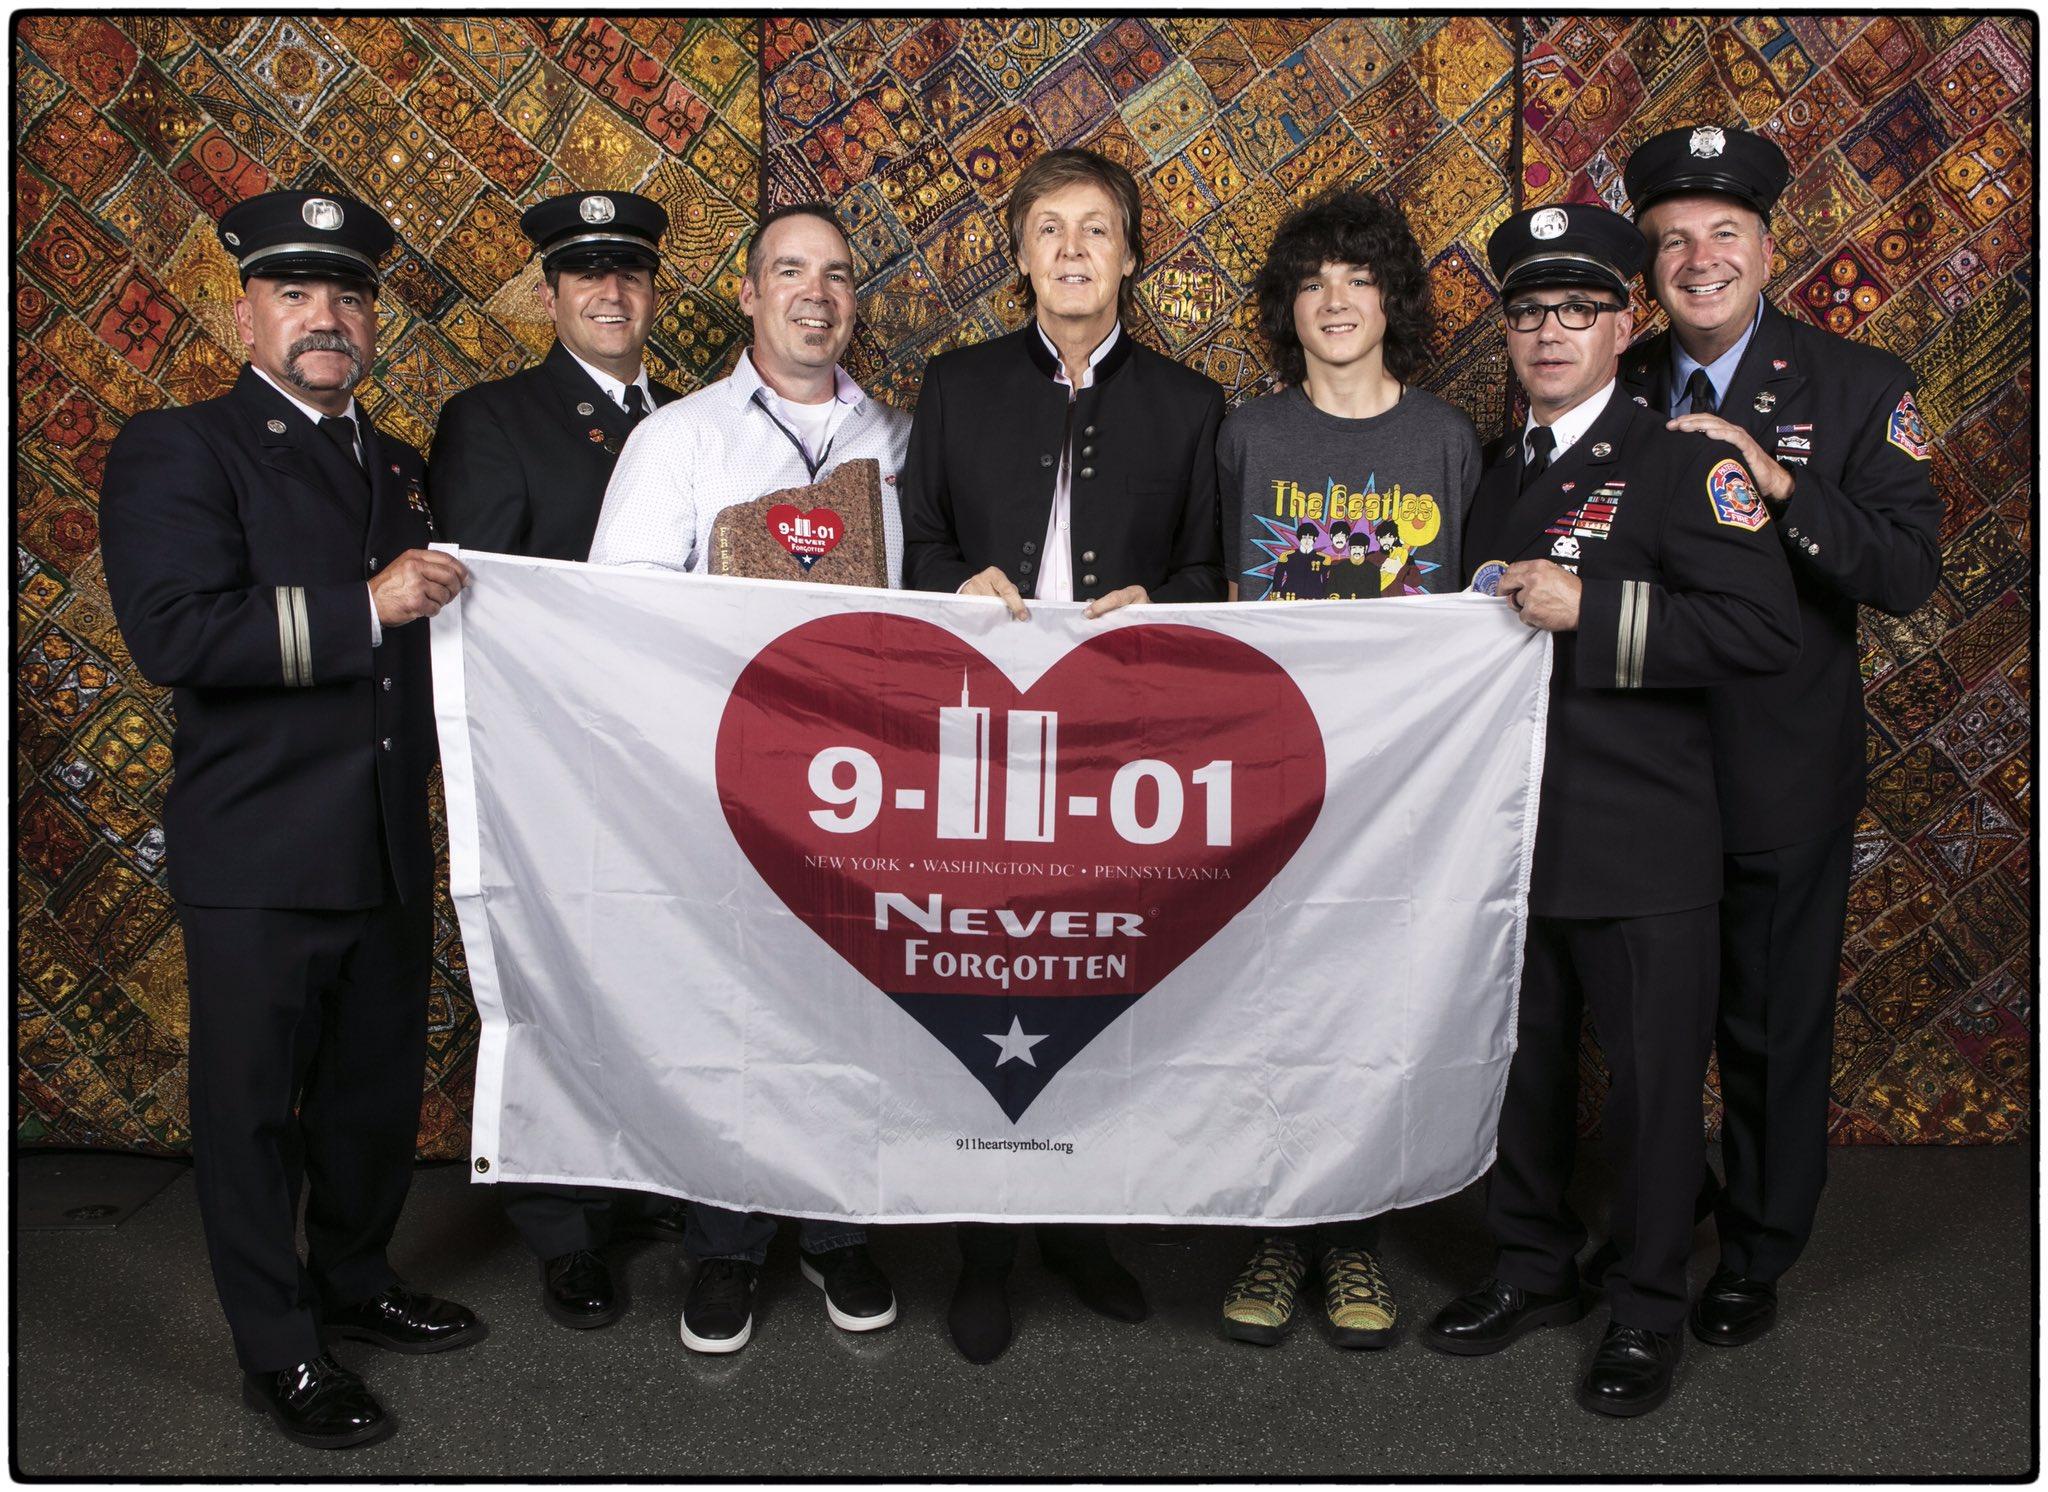 The Beatles Polska: Paul McCartney uczcił pamięć o ofiarach ataków na WTC - koncert w Newark